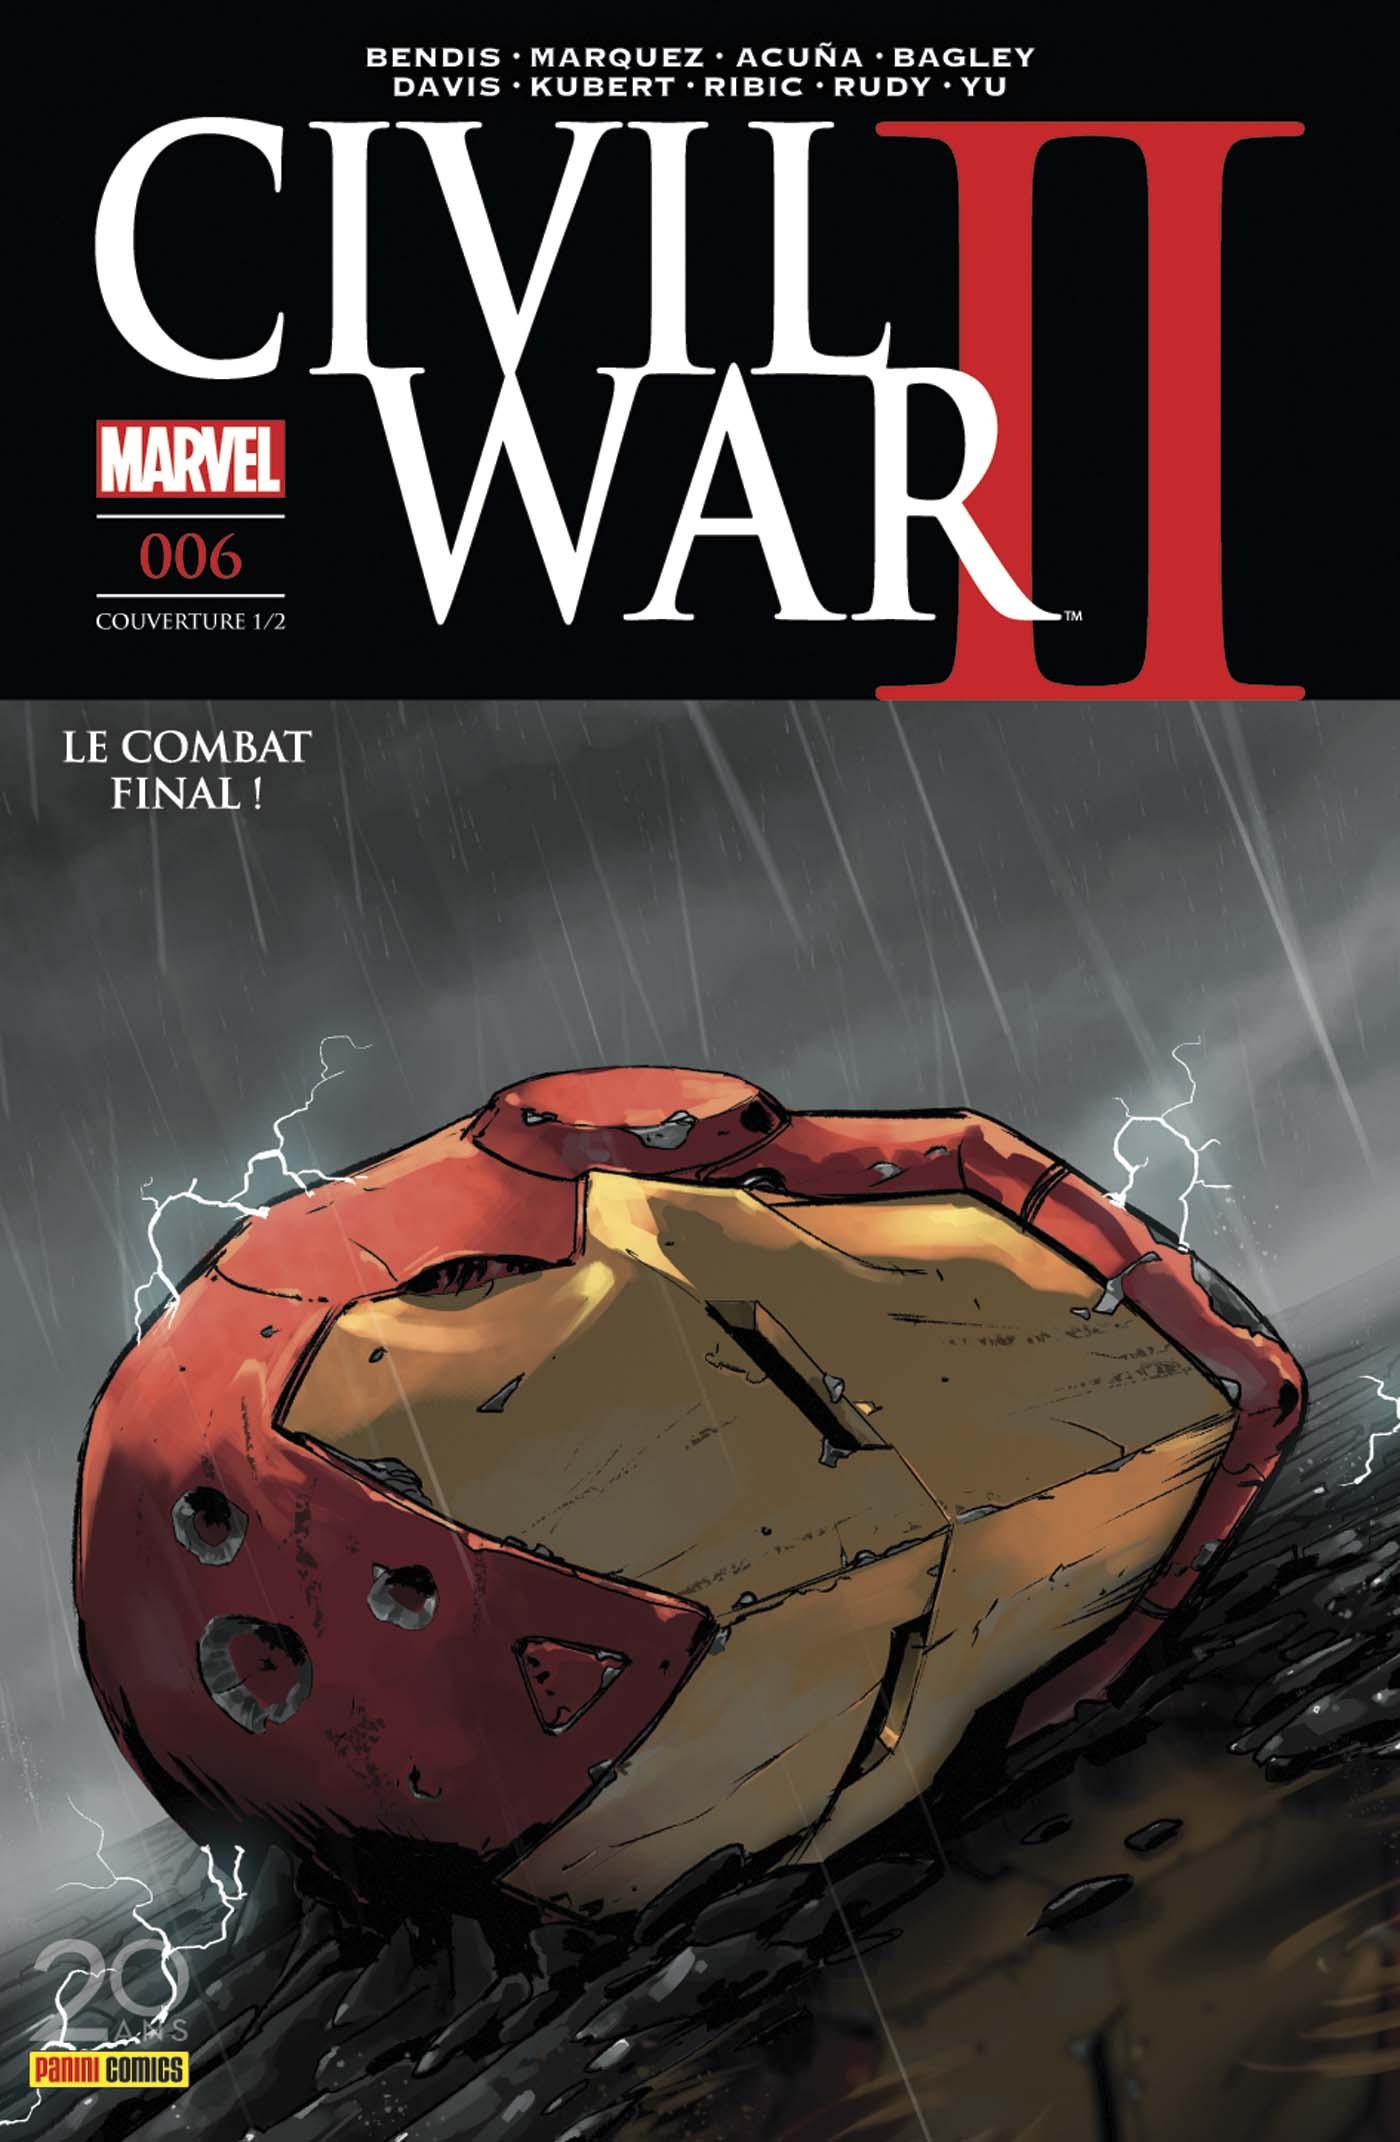 CIVIL WAR II 6 (Couv 1/2)